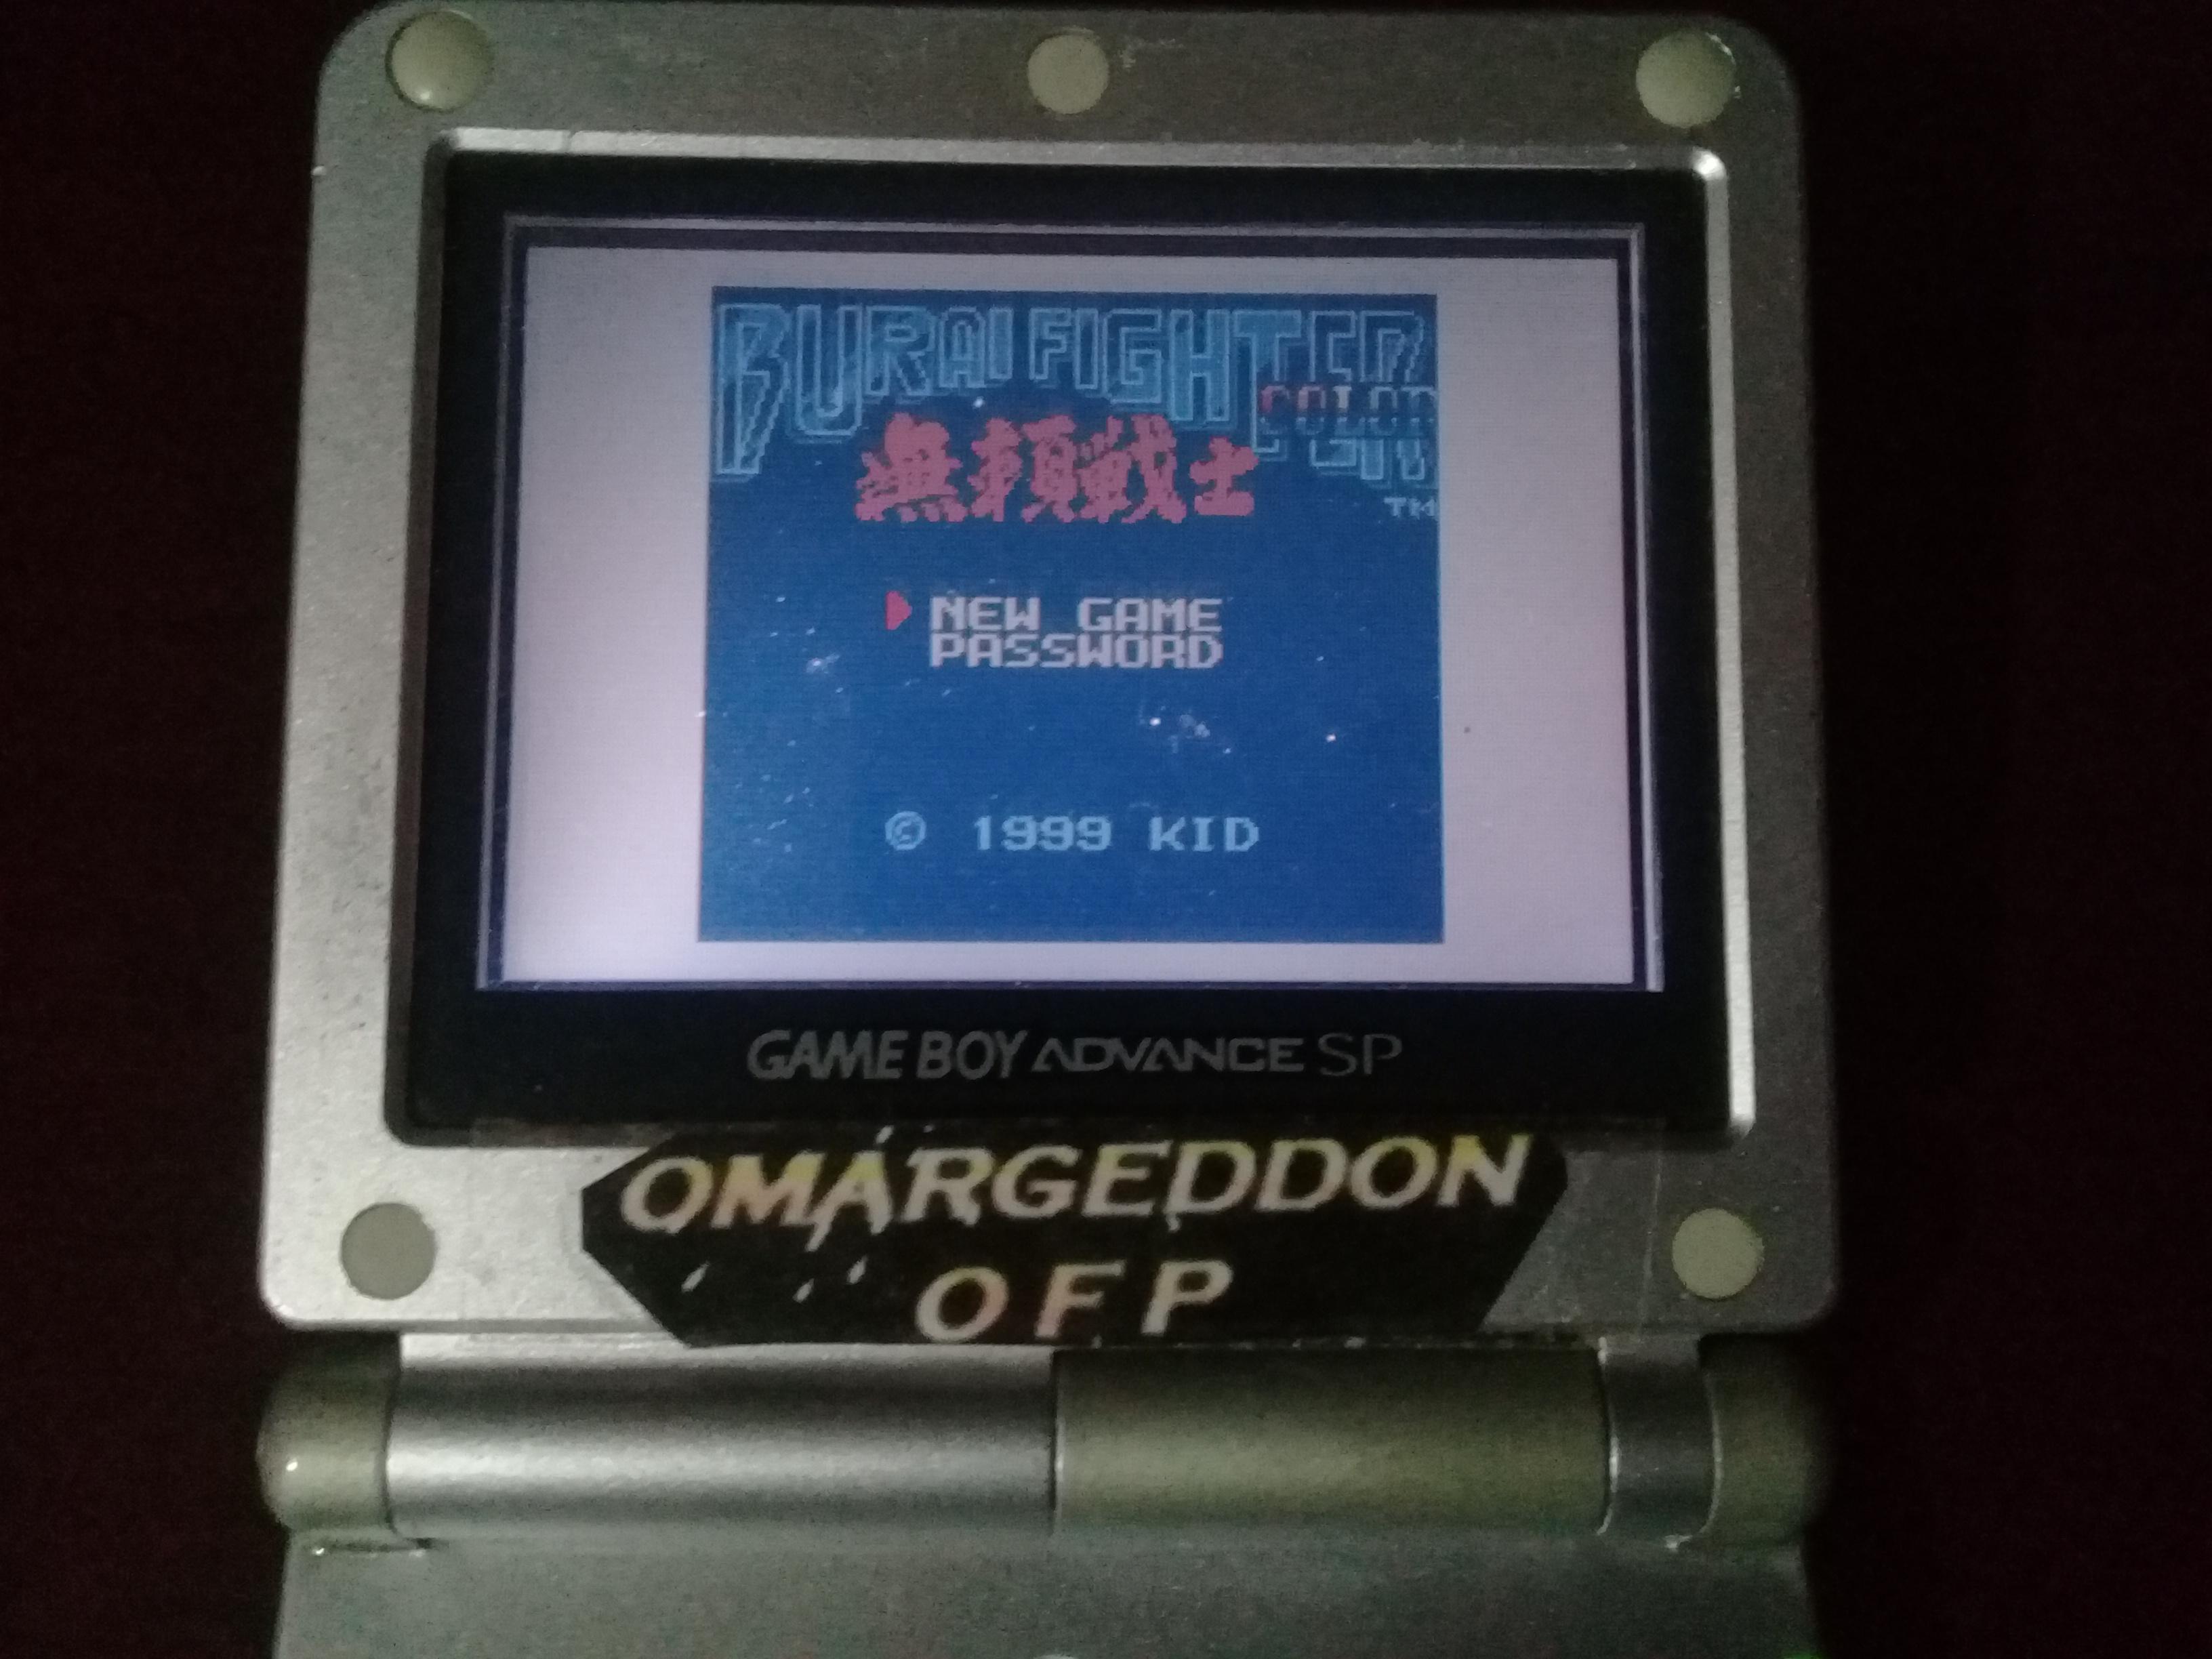 omargeddon: Burai Fighter Color [Albatross] (Game Boy Color) 102,570 points on 2019-05-24 10:55:37